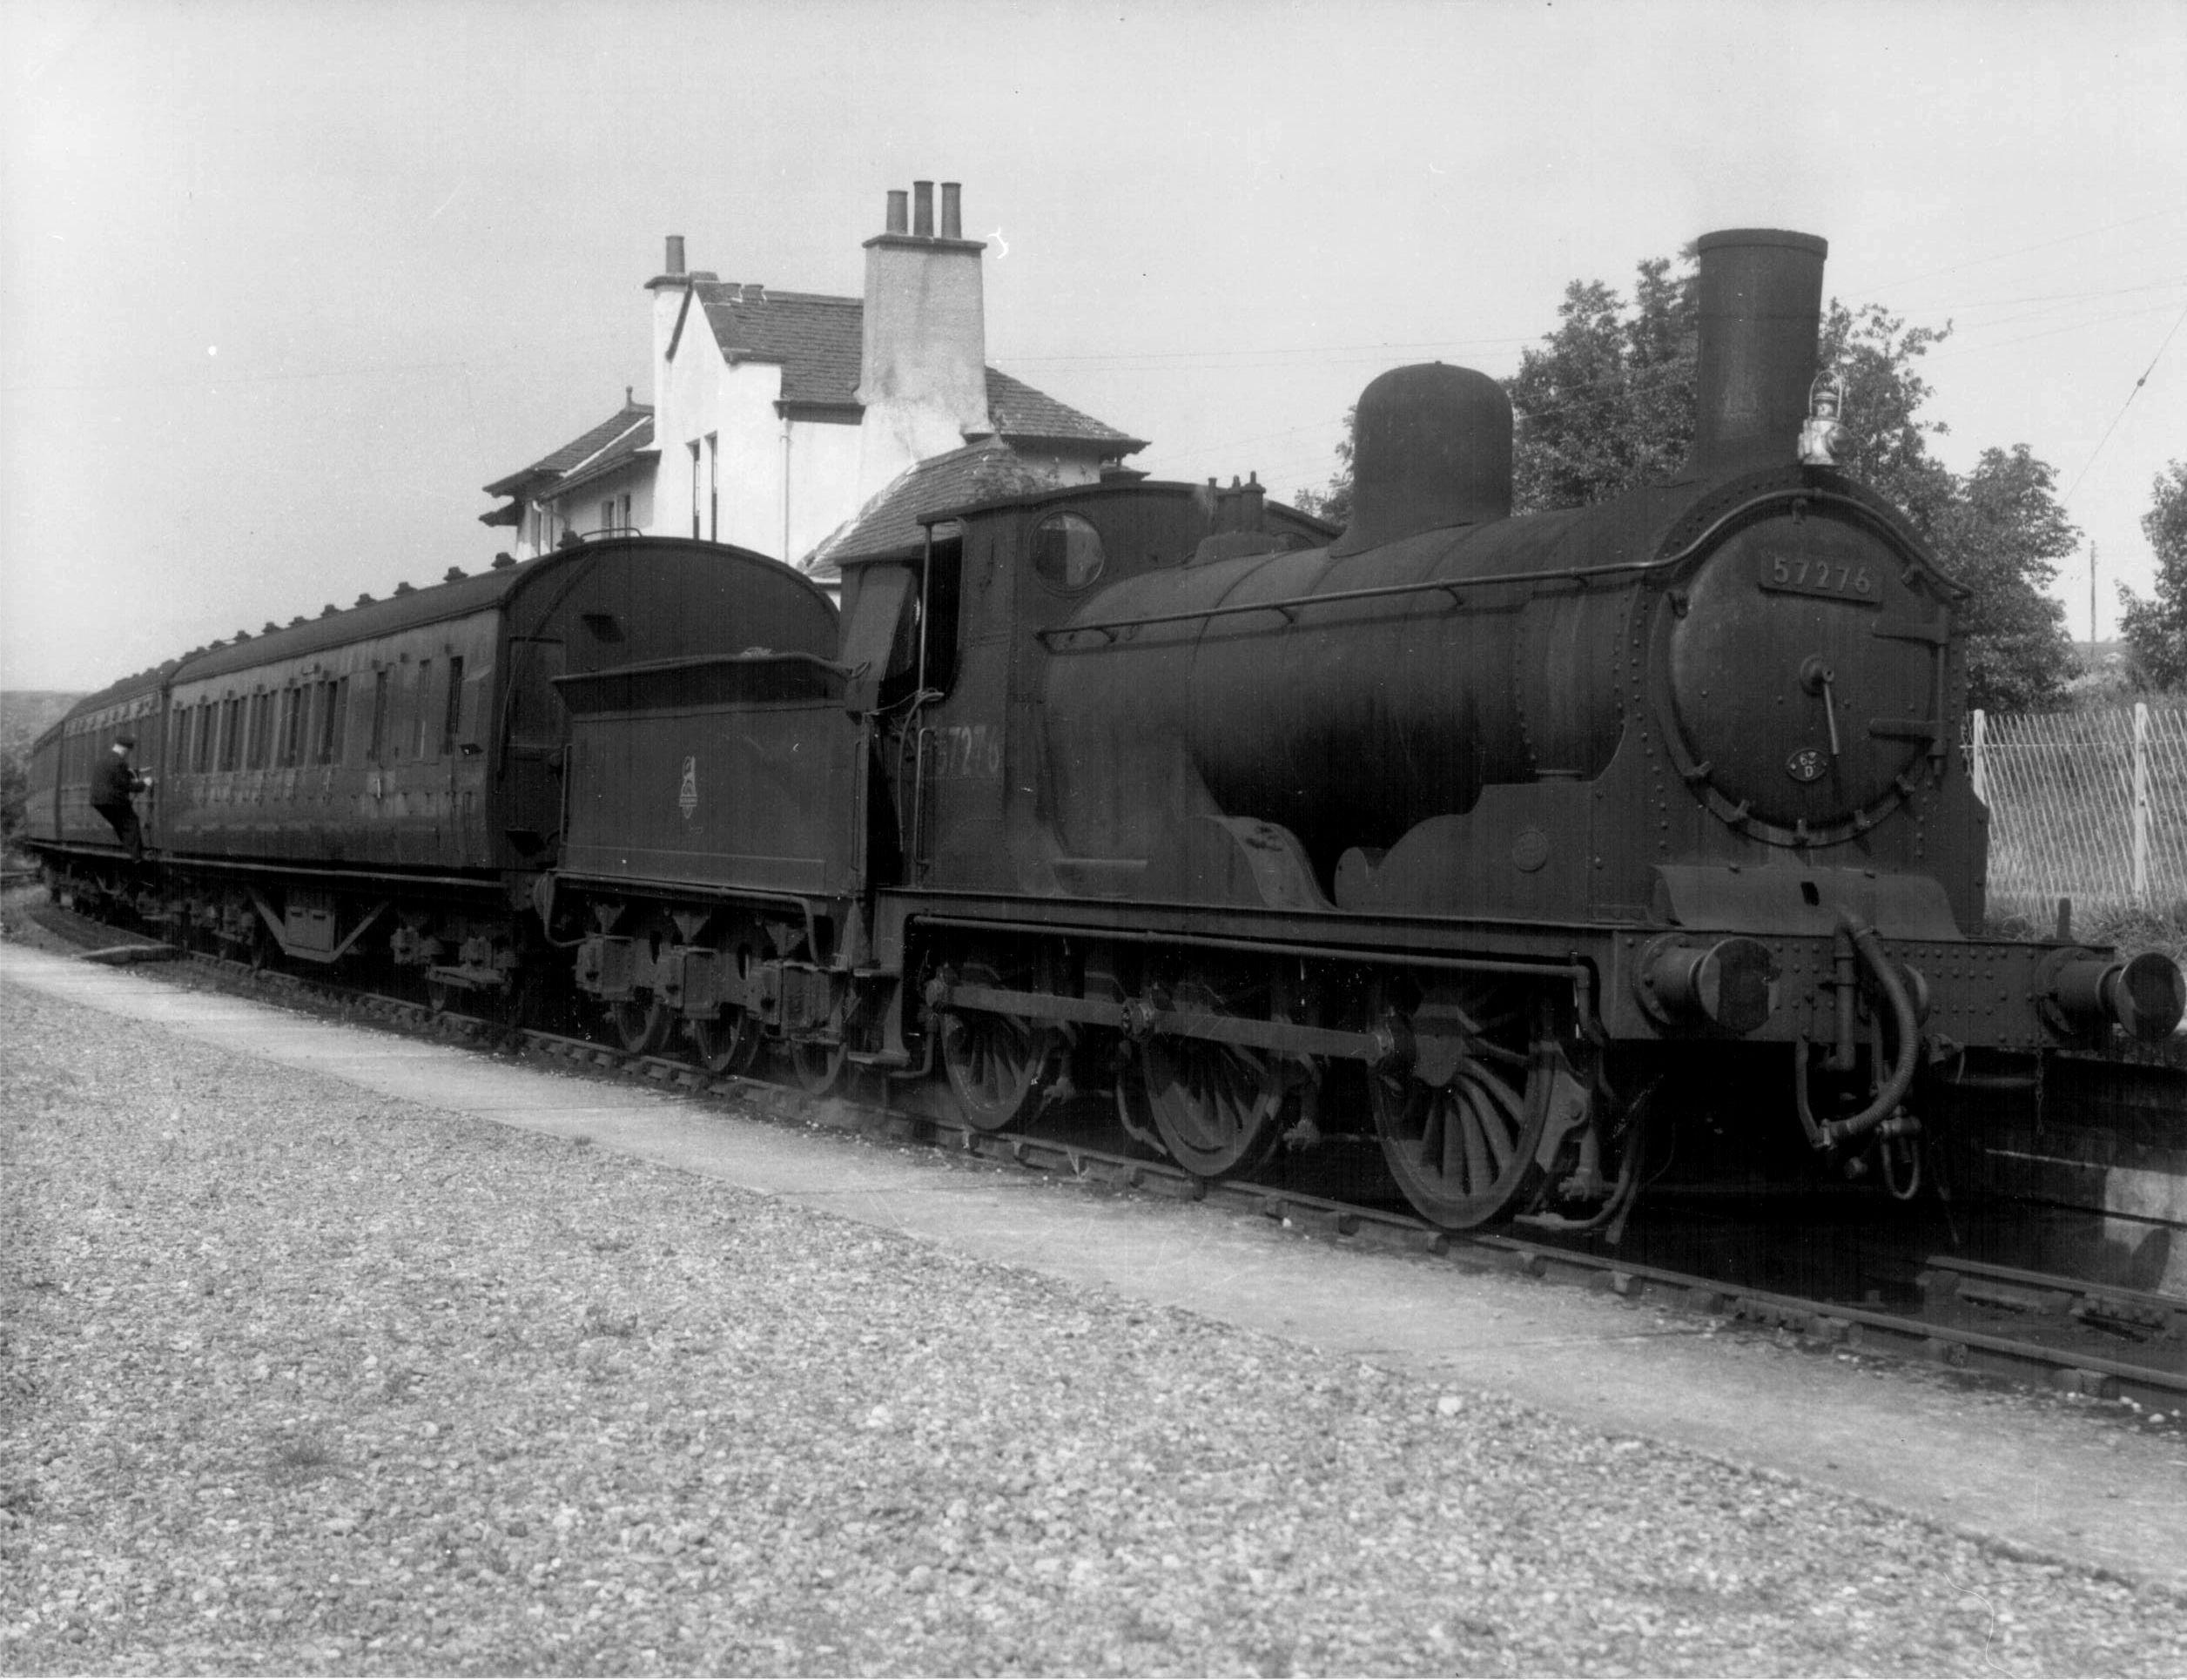 Locomotive Steam Engine Diagram 184 Best Railway Series Images On Pinterest Of Locomotive Steam Engine Diagram